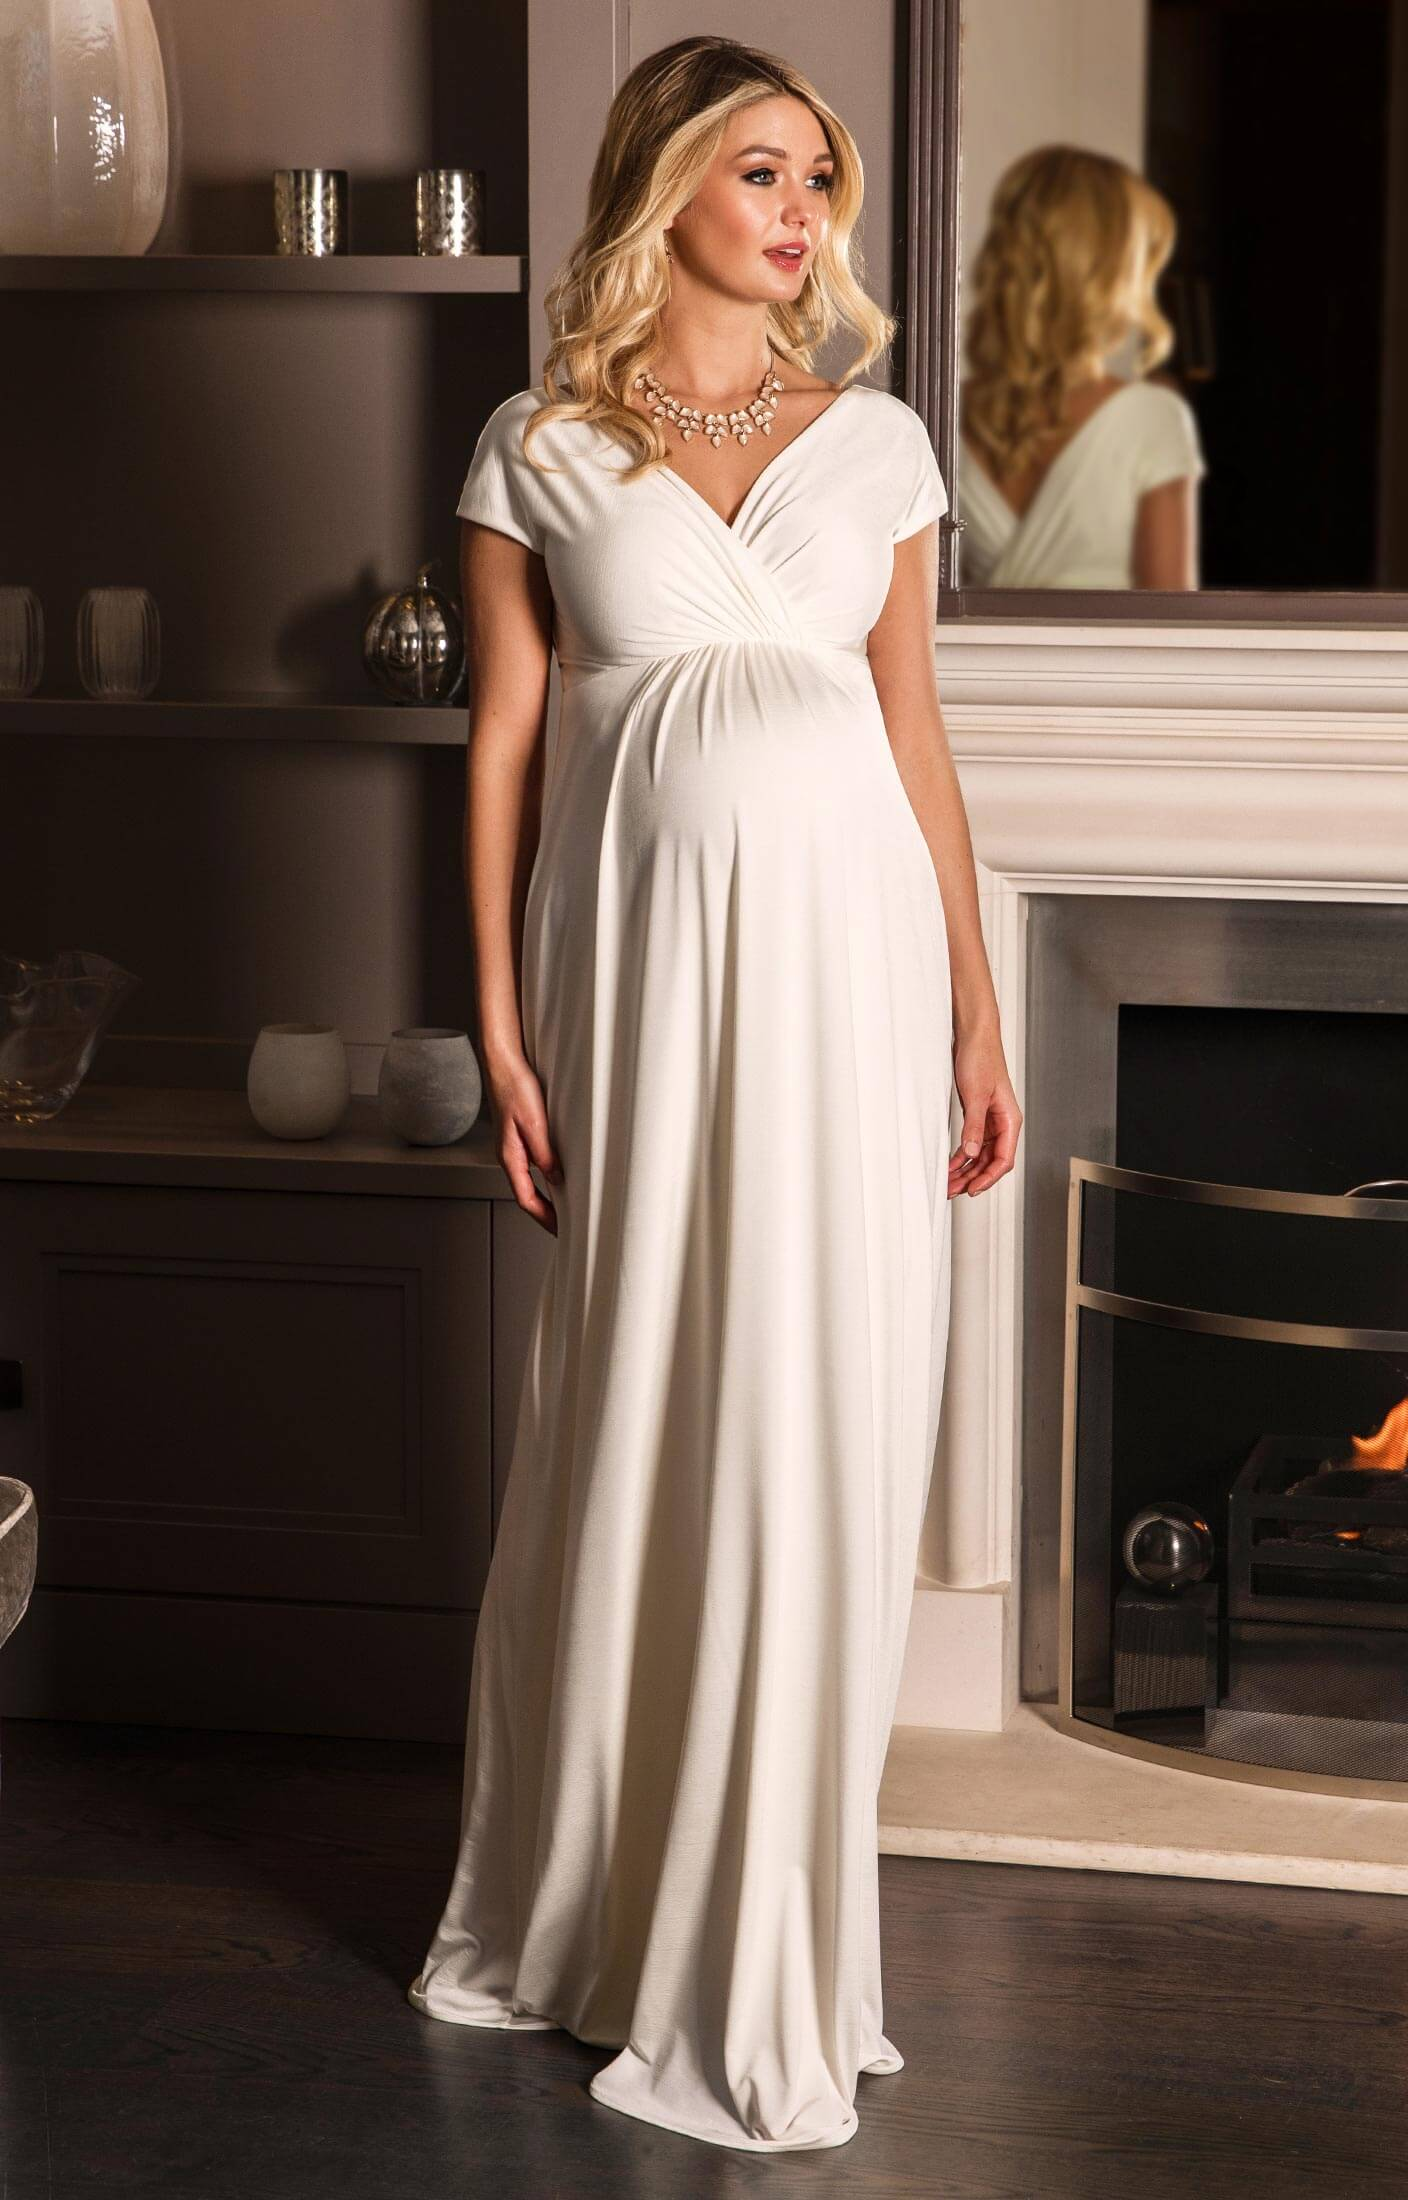 Francesca Maternity Maxi Wedding Dress Ivory Maternity Wedding Dresses Evening Wear And Party Clothes By Tiffany Rose Uk,Ribbon Corset Back Wedding Dress